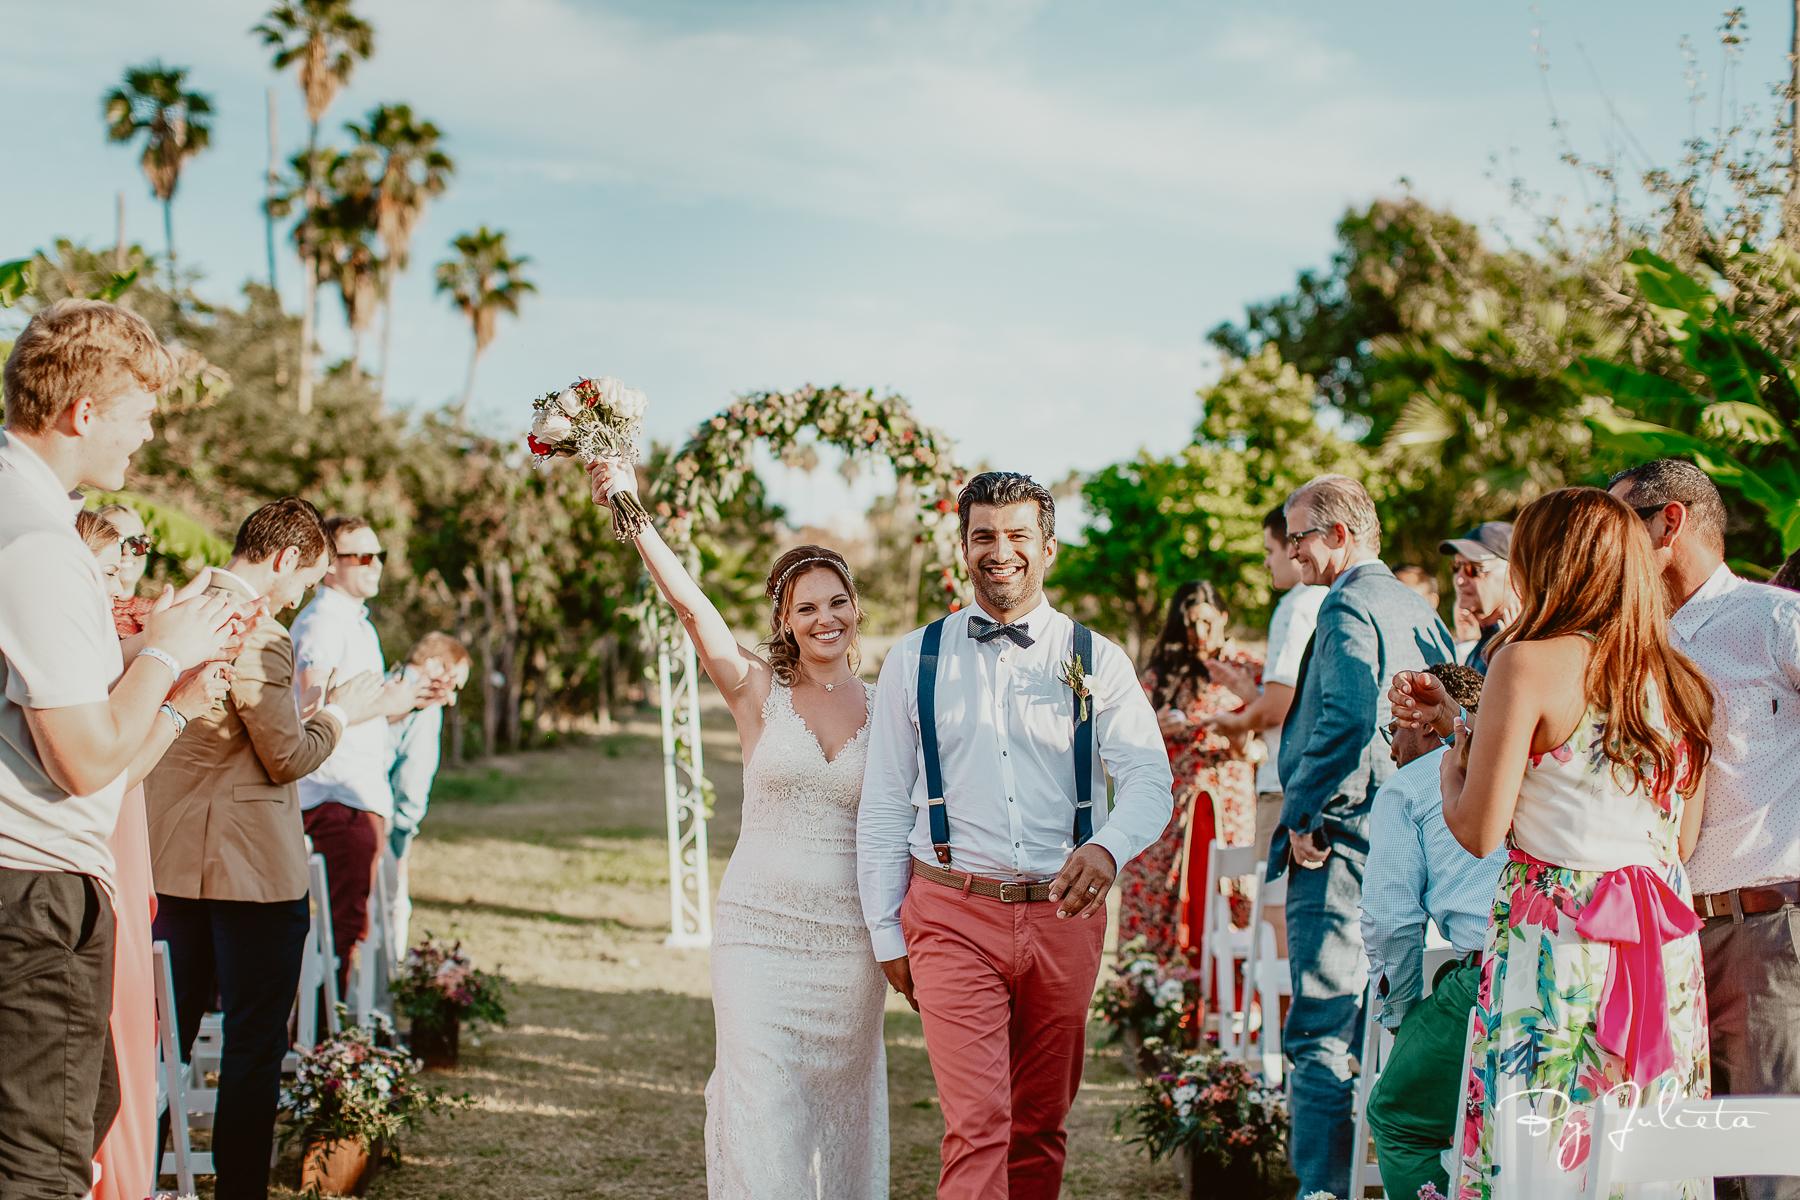 Los Tamarindos Wedding. D+L. Julieta Amezcua Photography. (22 of 25).jpg